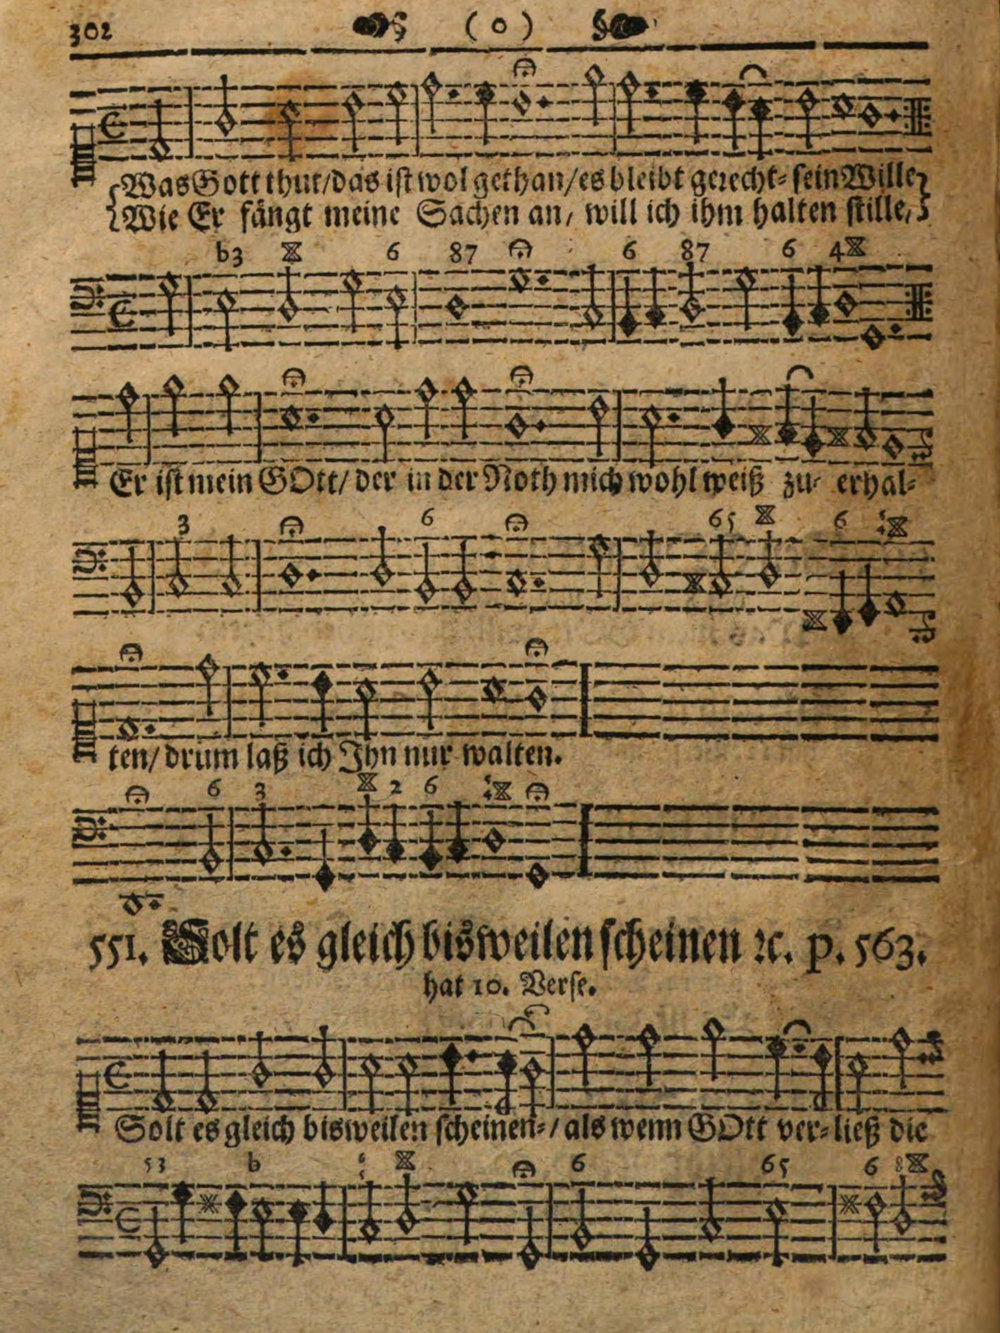 Witt-PsalmodiaSacra-1715-321.jpg